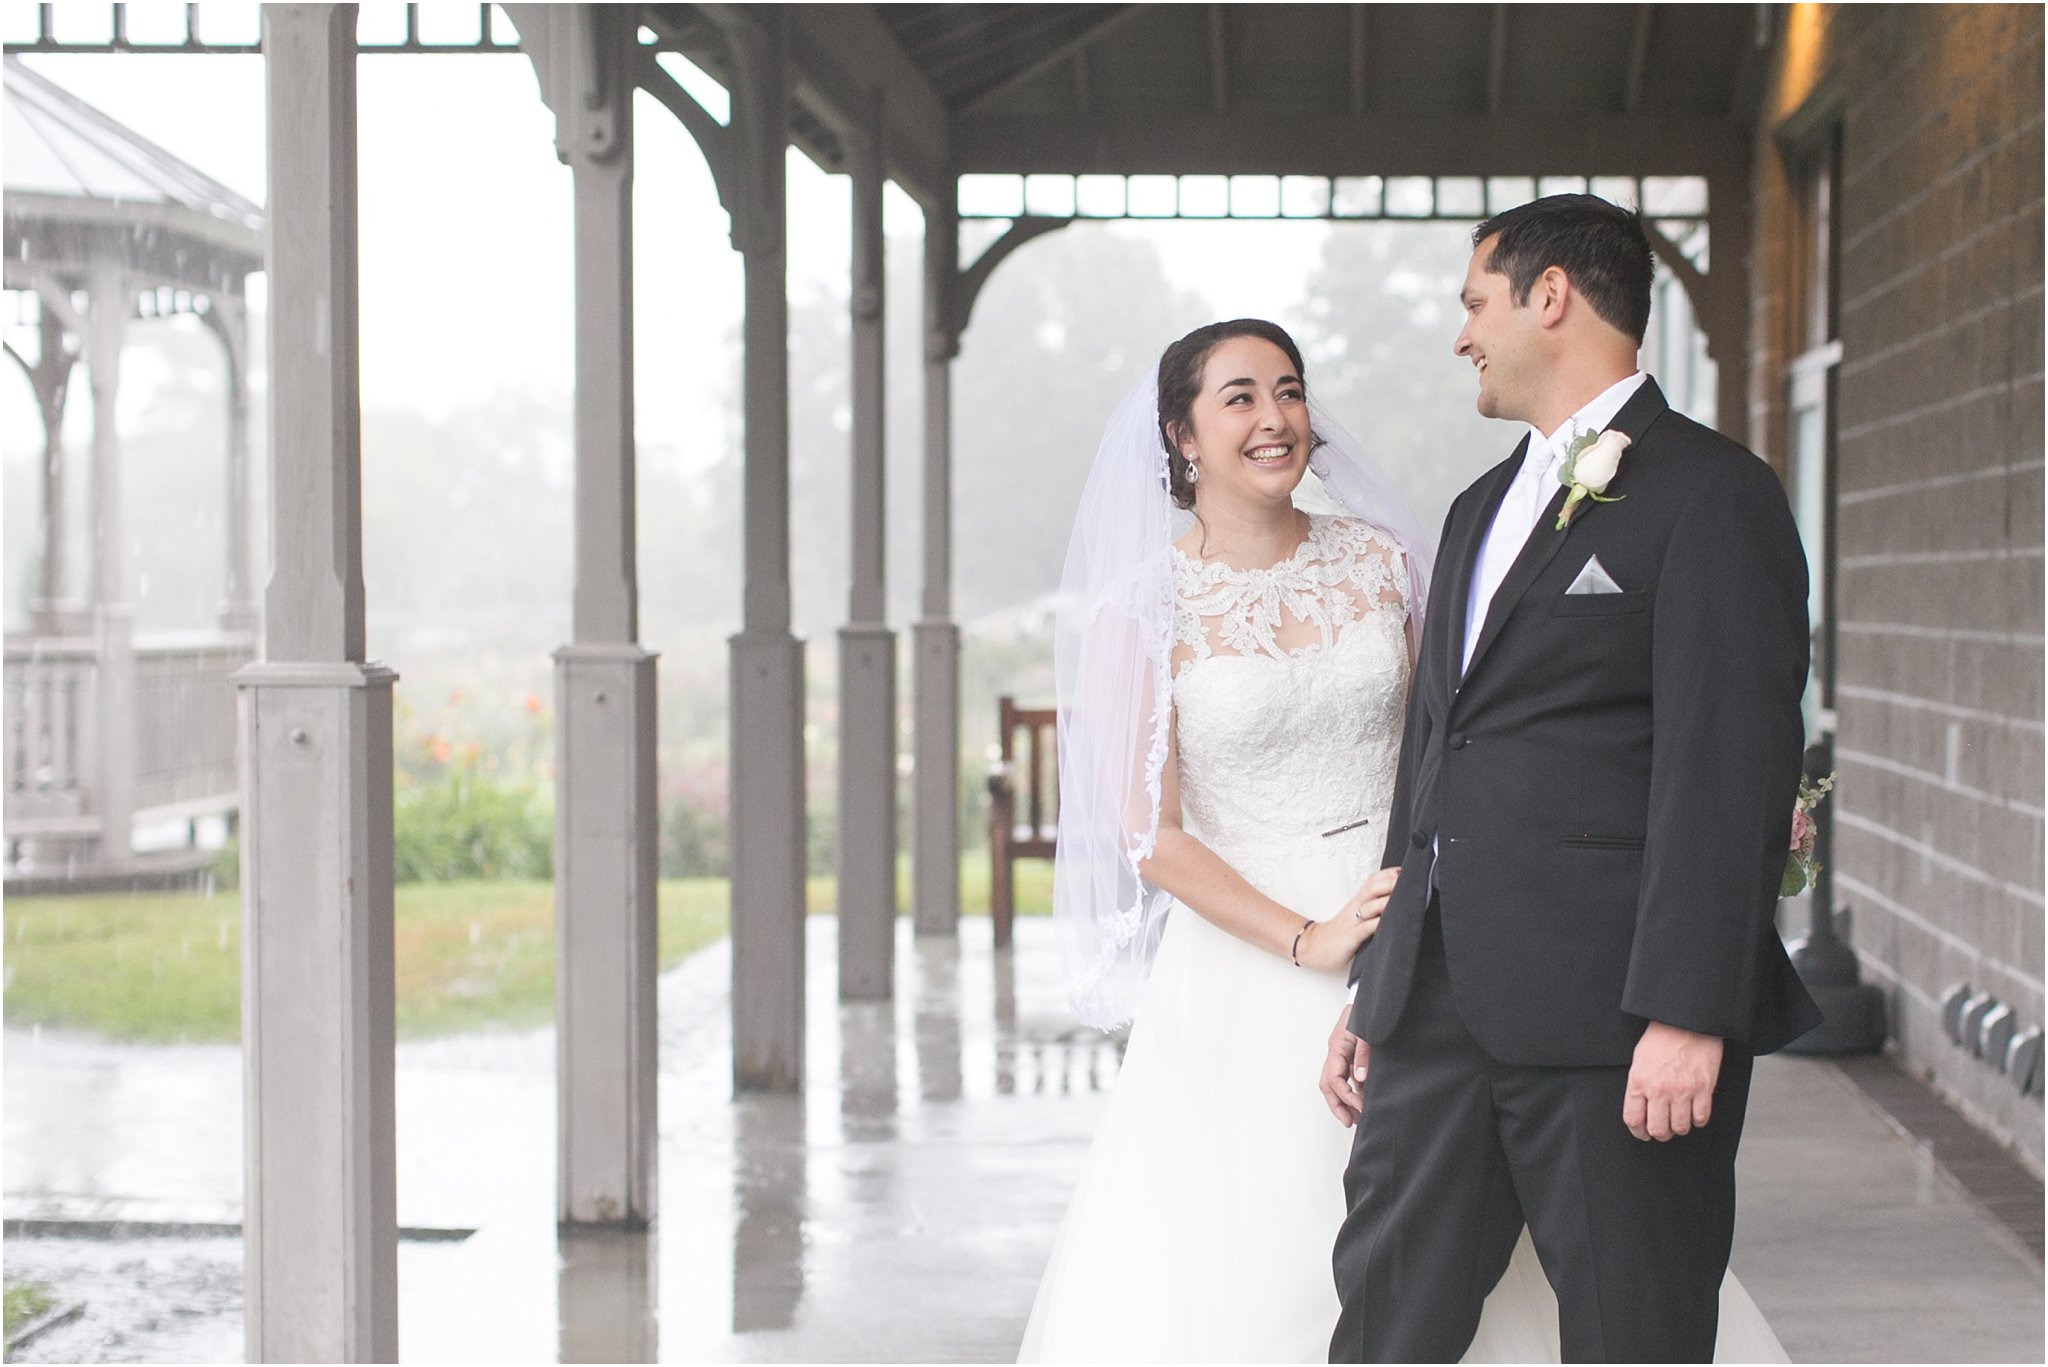 jessica_ryan_photography_virginia_wedding_photographer_wedding_hurricane_norfolk_botanical_gardens_hurricane_matthew_wedding_3563